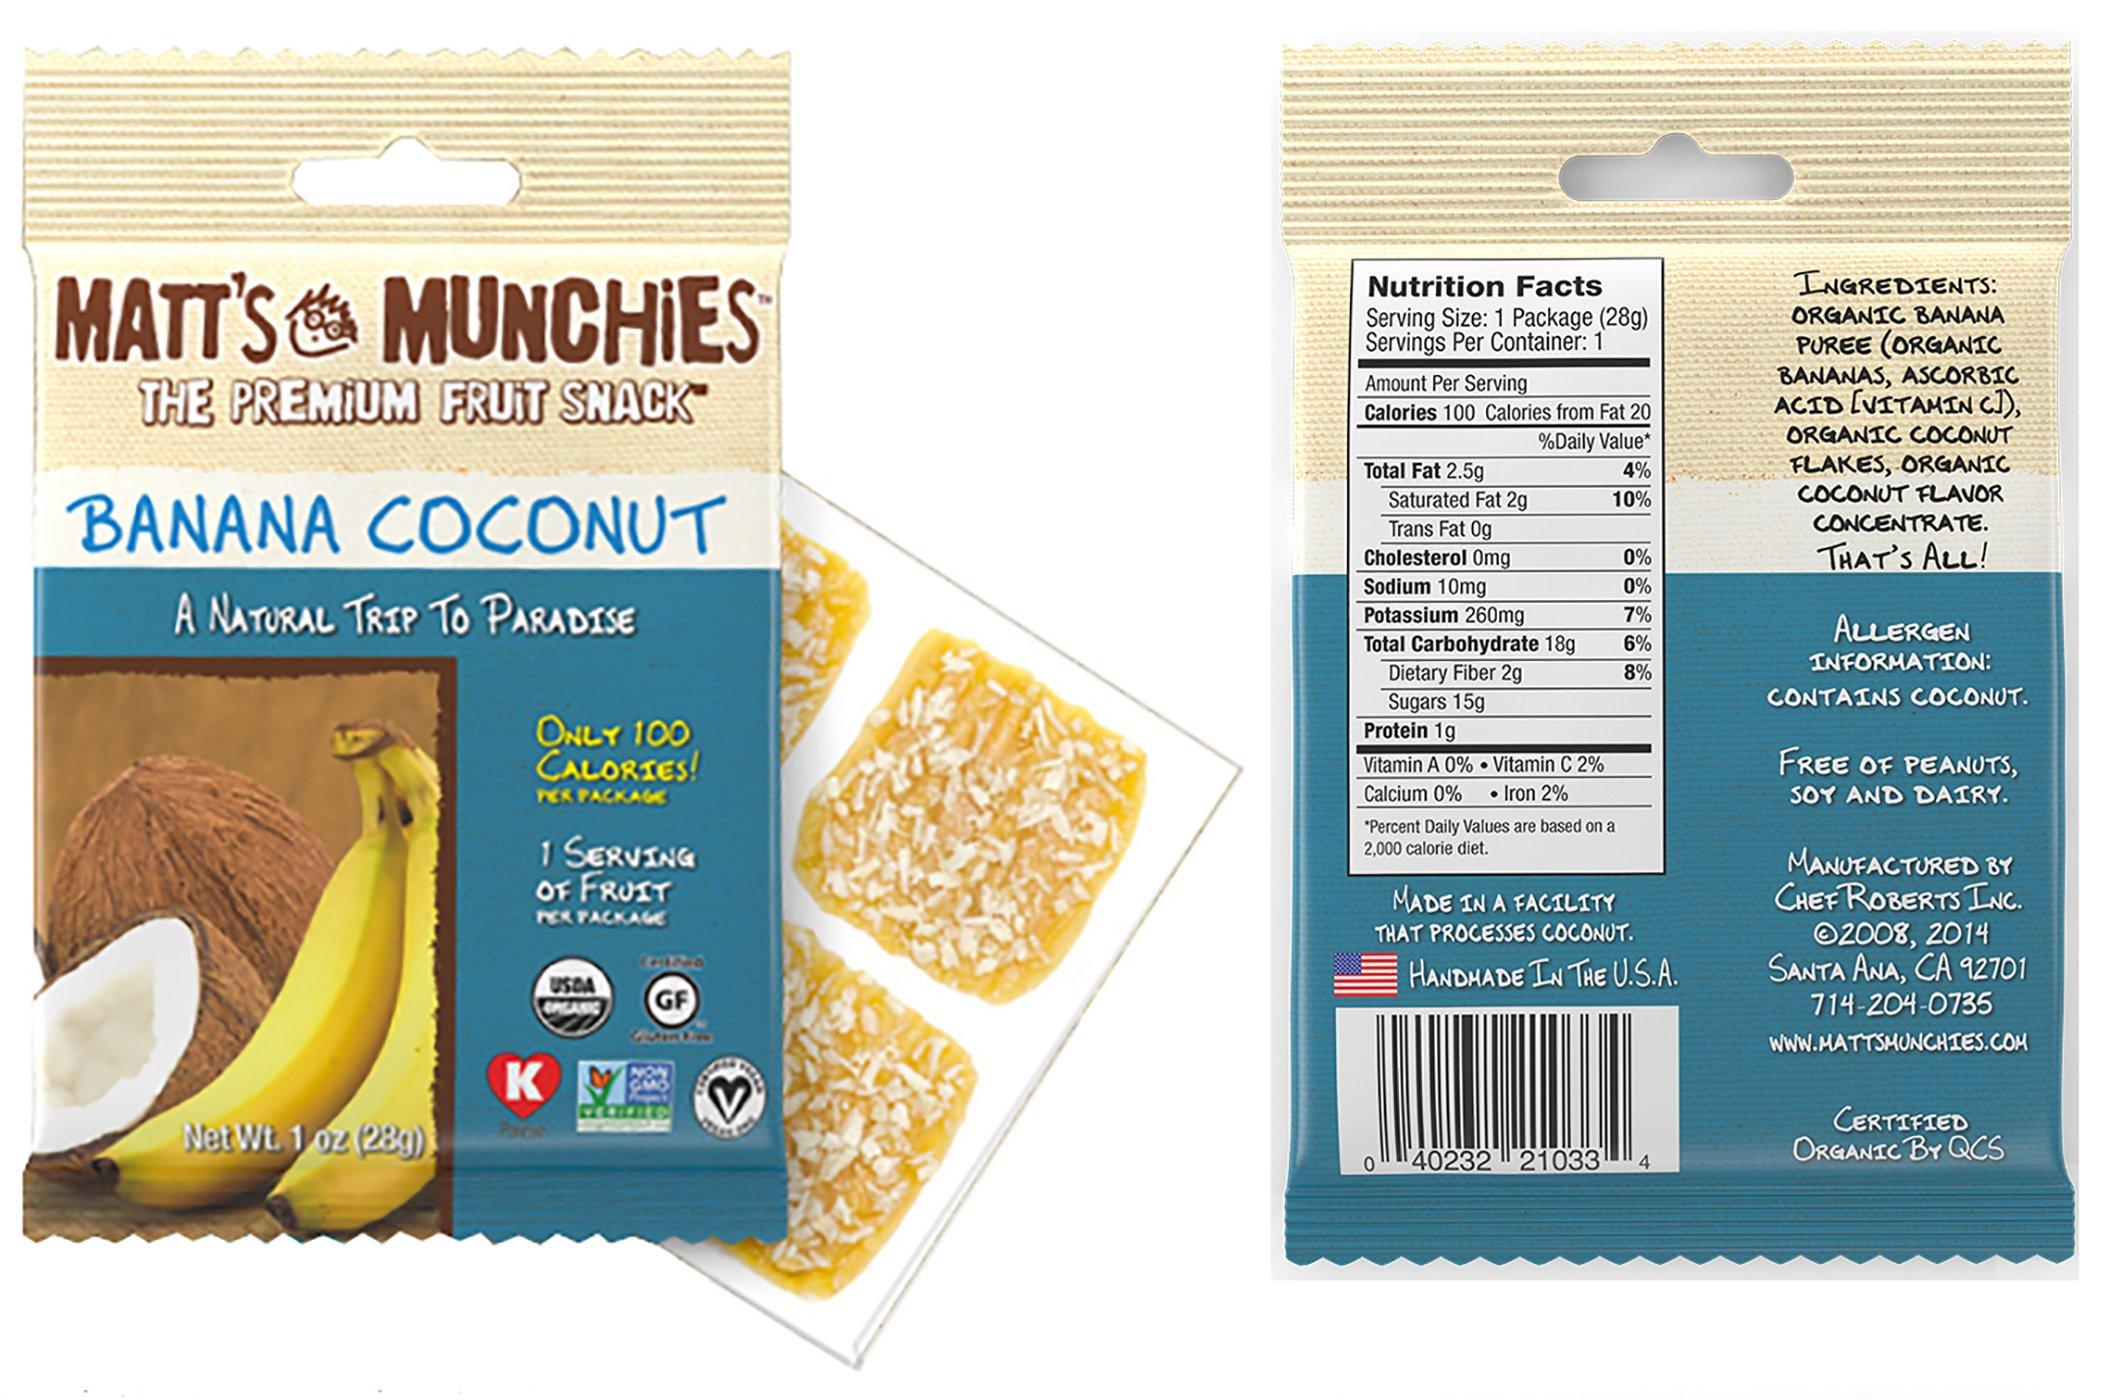 Matt's Munchies Tropical Assortment Organic Non-GMO Fruit Leather Peelable Fruit Snacks 25 Count Variety Pack Caddy - Mango, Island Mango, Tropical Punch, Banana Coconut & Apple by Matt's Munchies (Image #3)